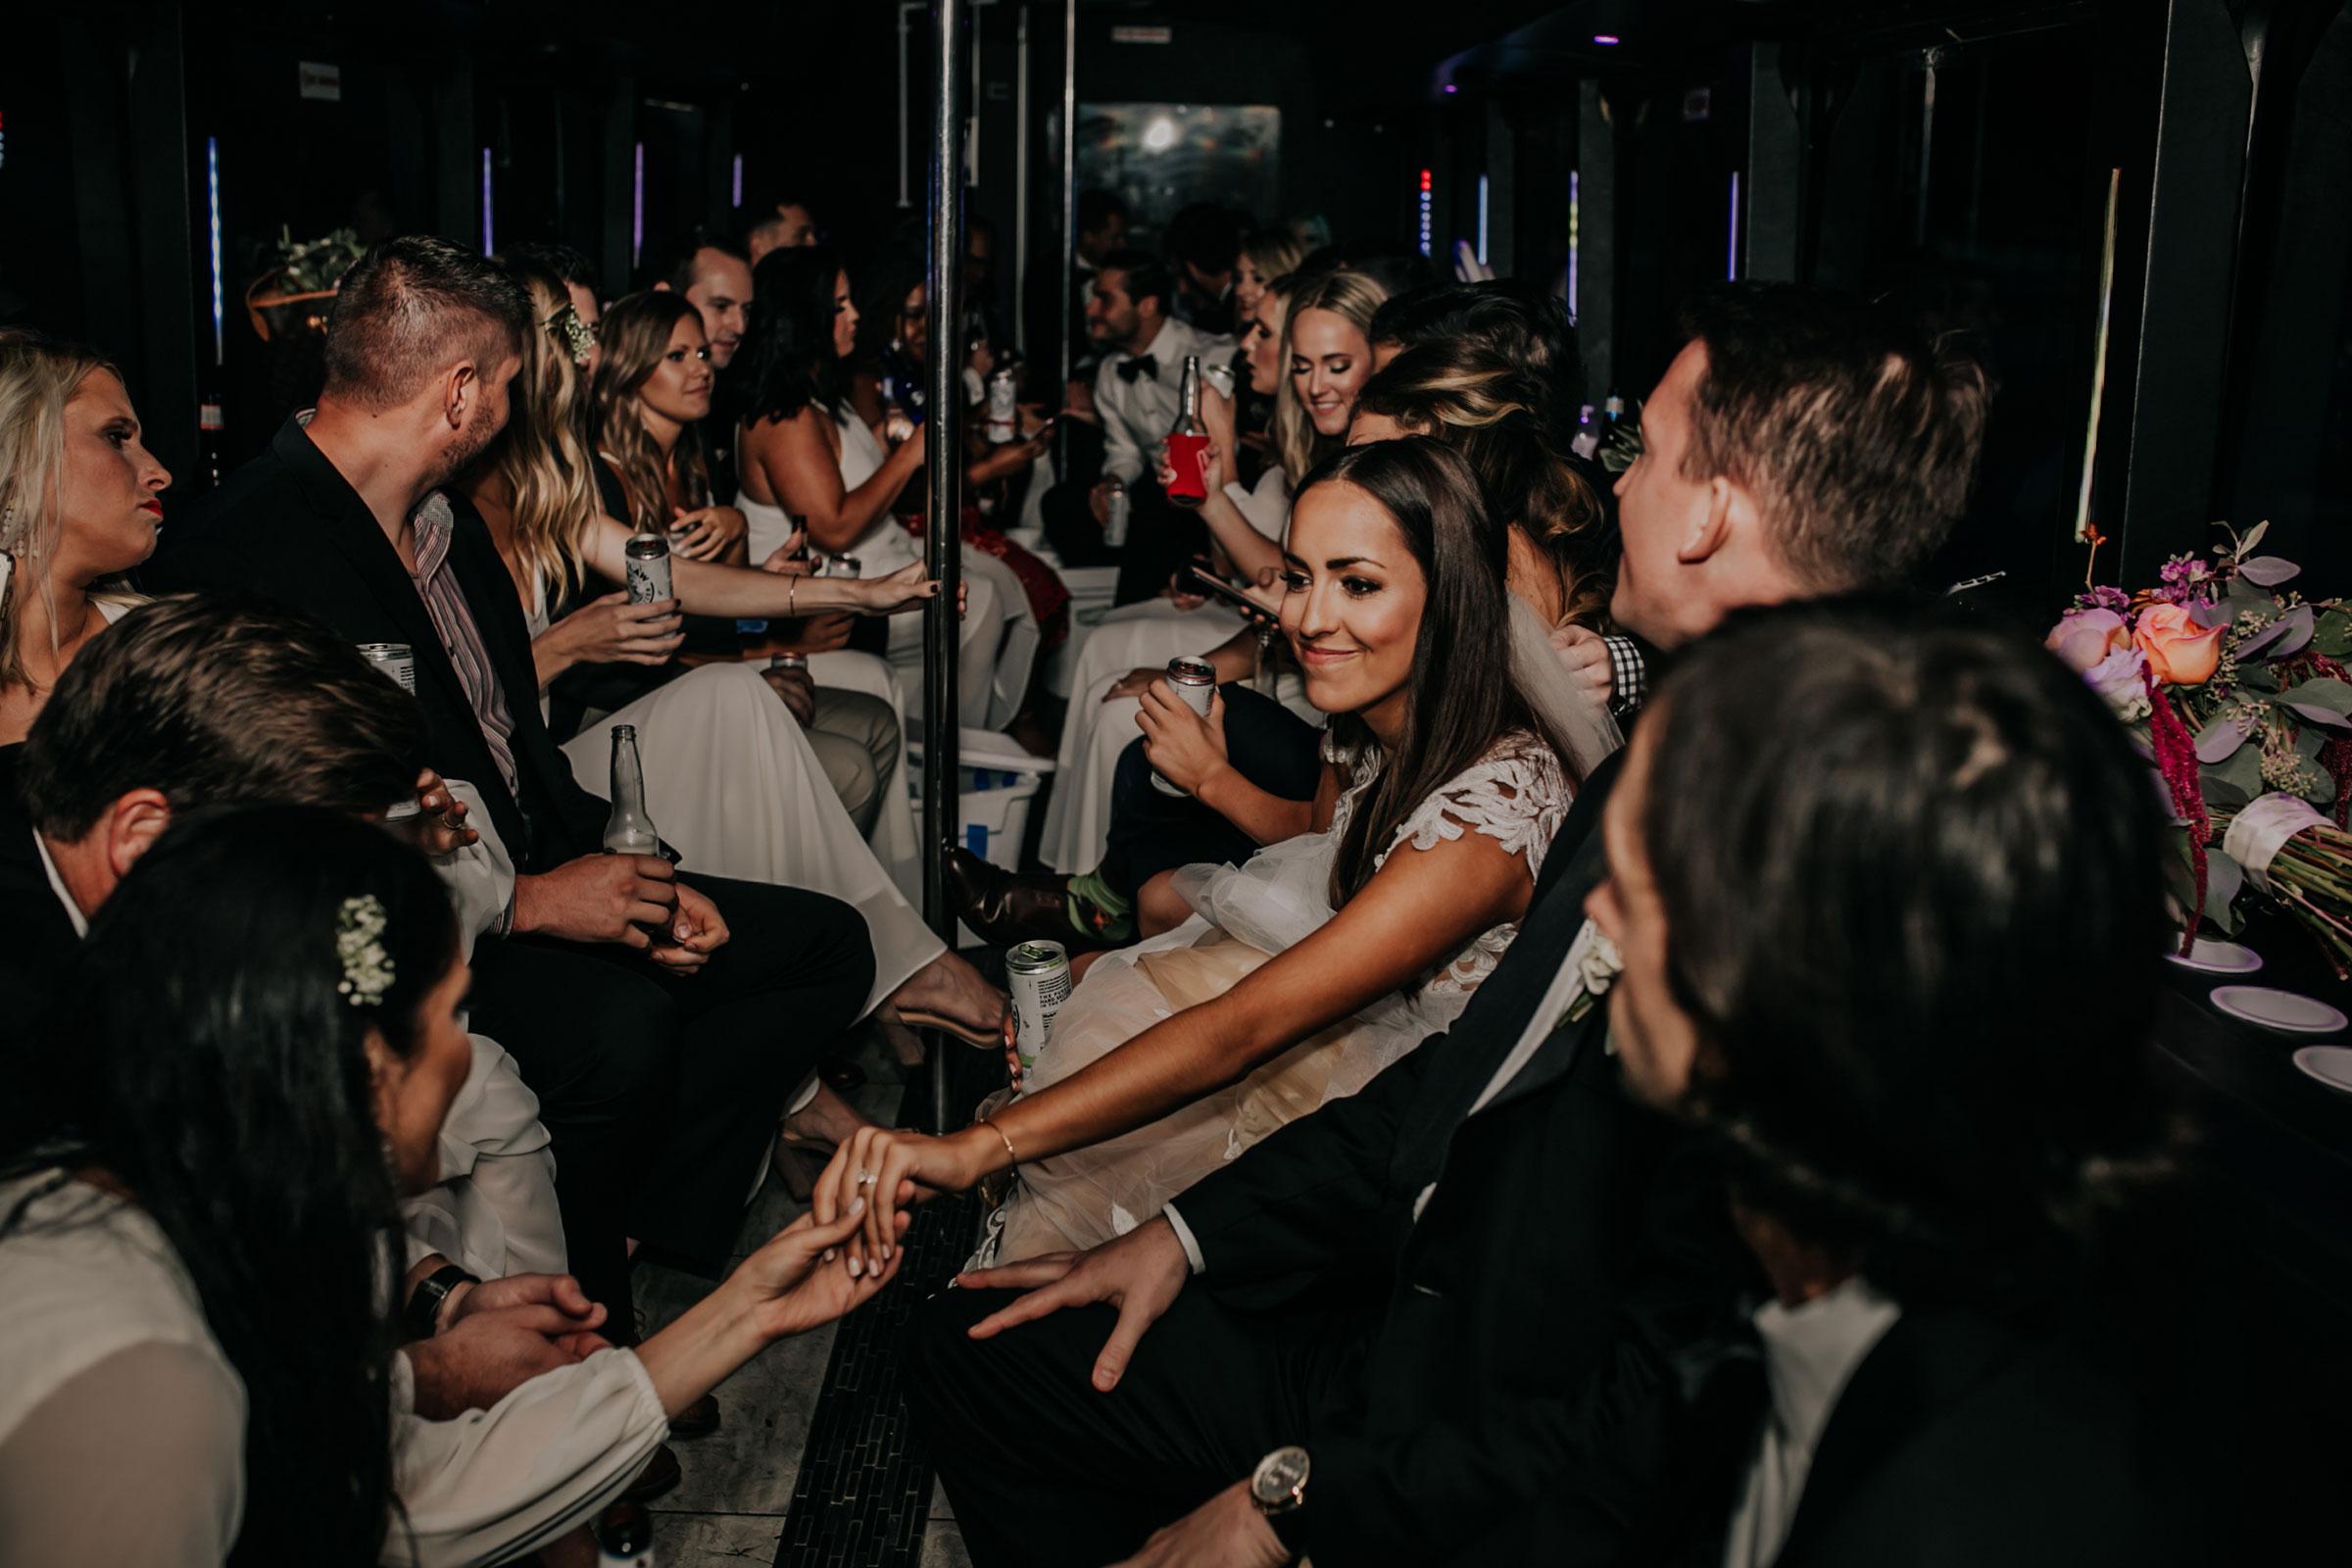 bride-showing-off-wedding-ring-on-party-bus-omaha-nebraska-raelyn-ramey-photography.jpg